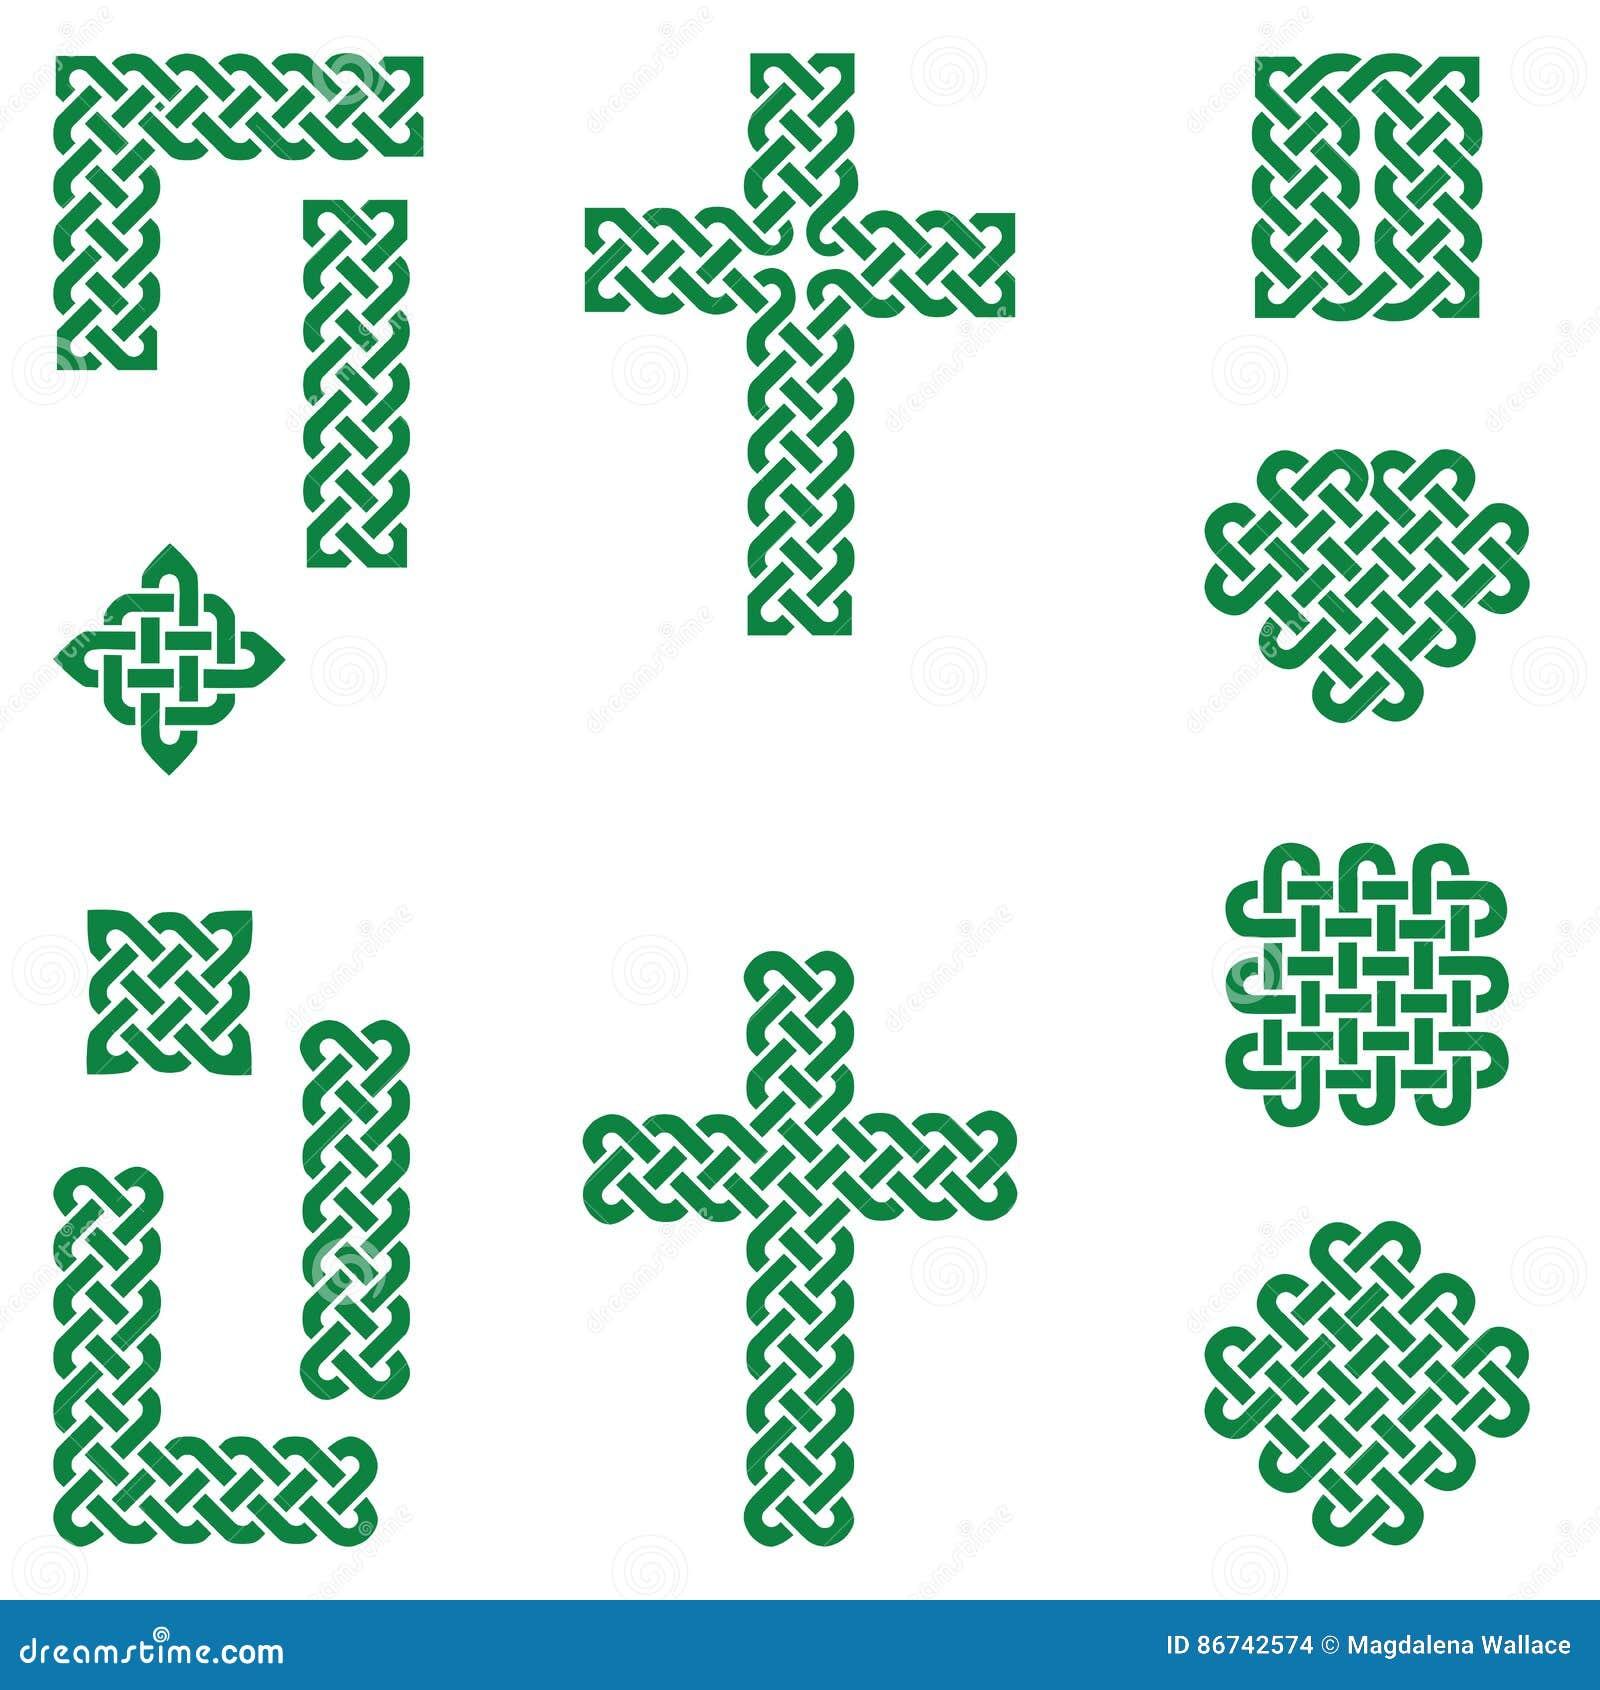 Celtic Style Endless Knot Symbols Including Border Line Heart